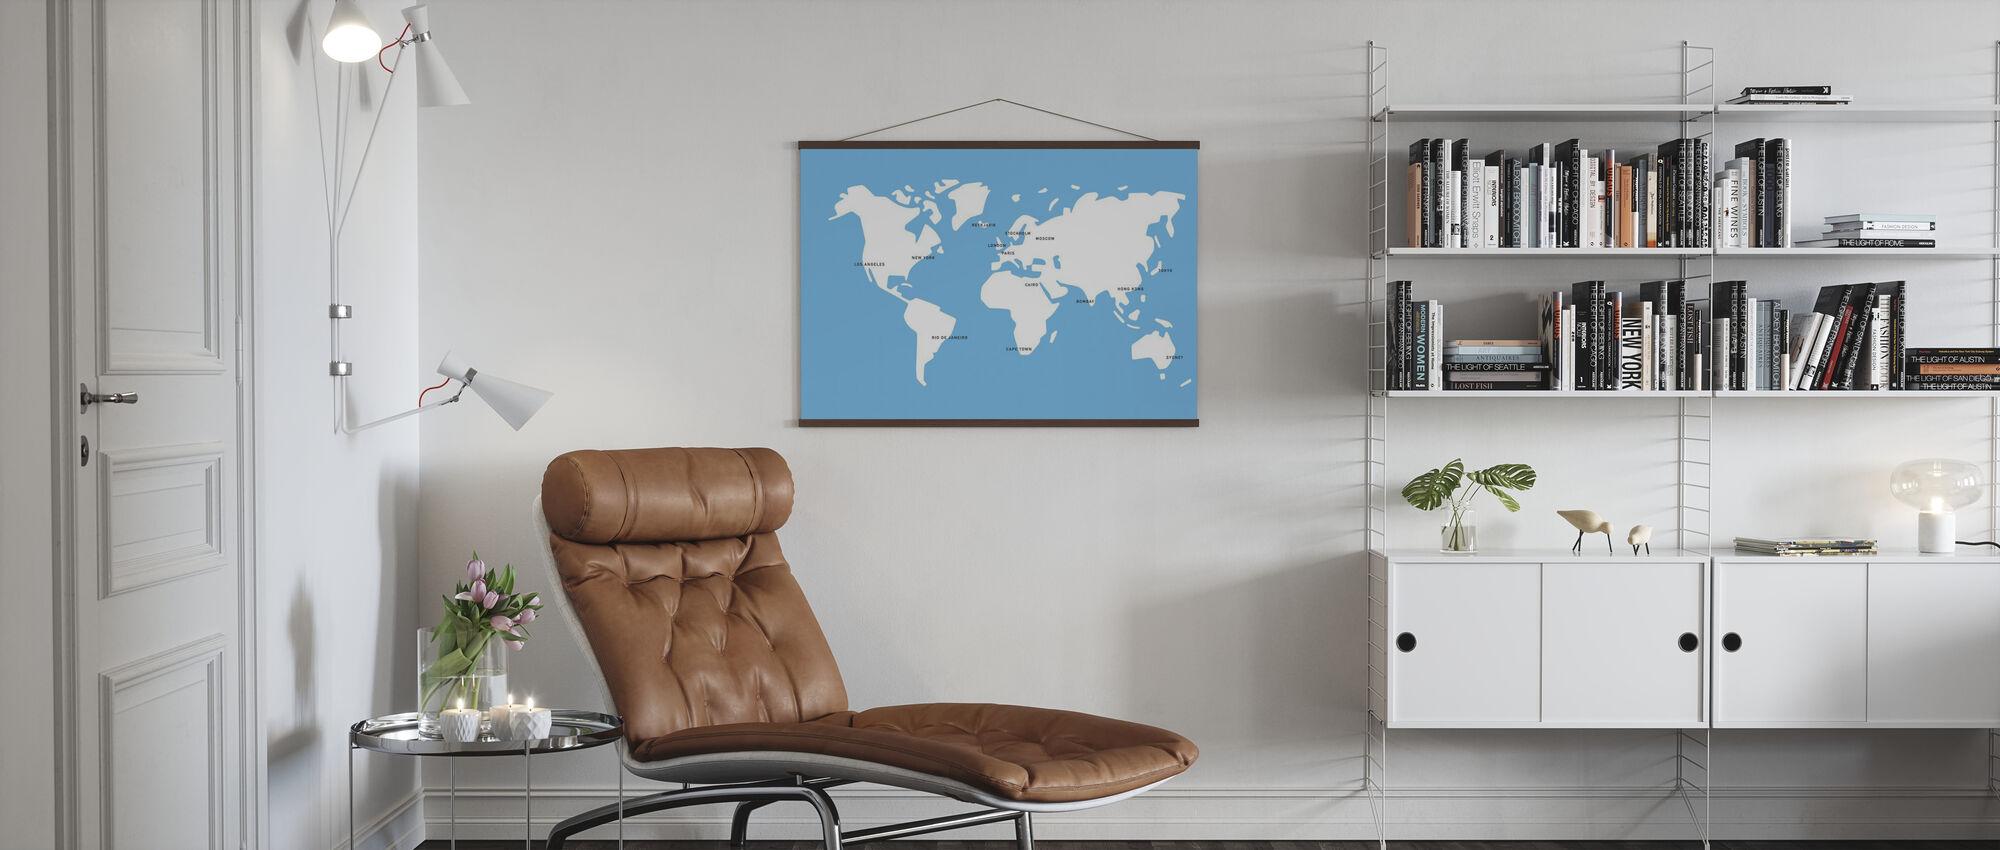 Mannerstal World Map - Poster - Living Room